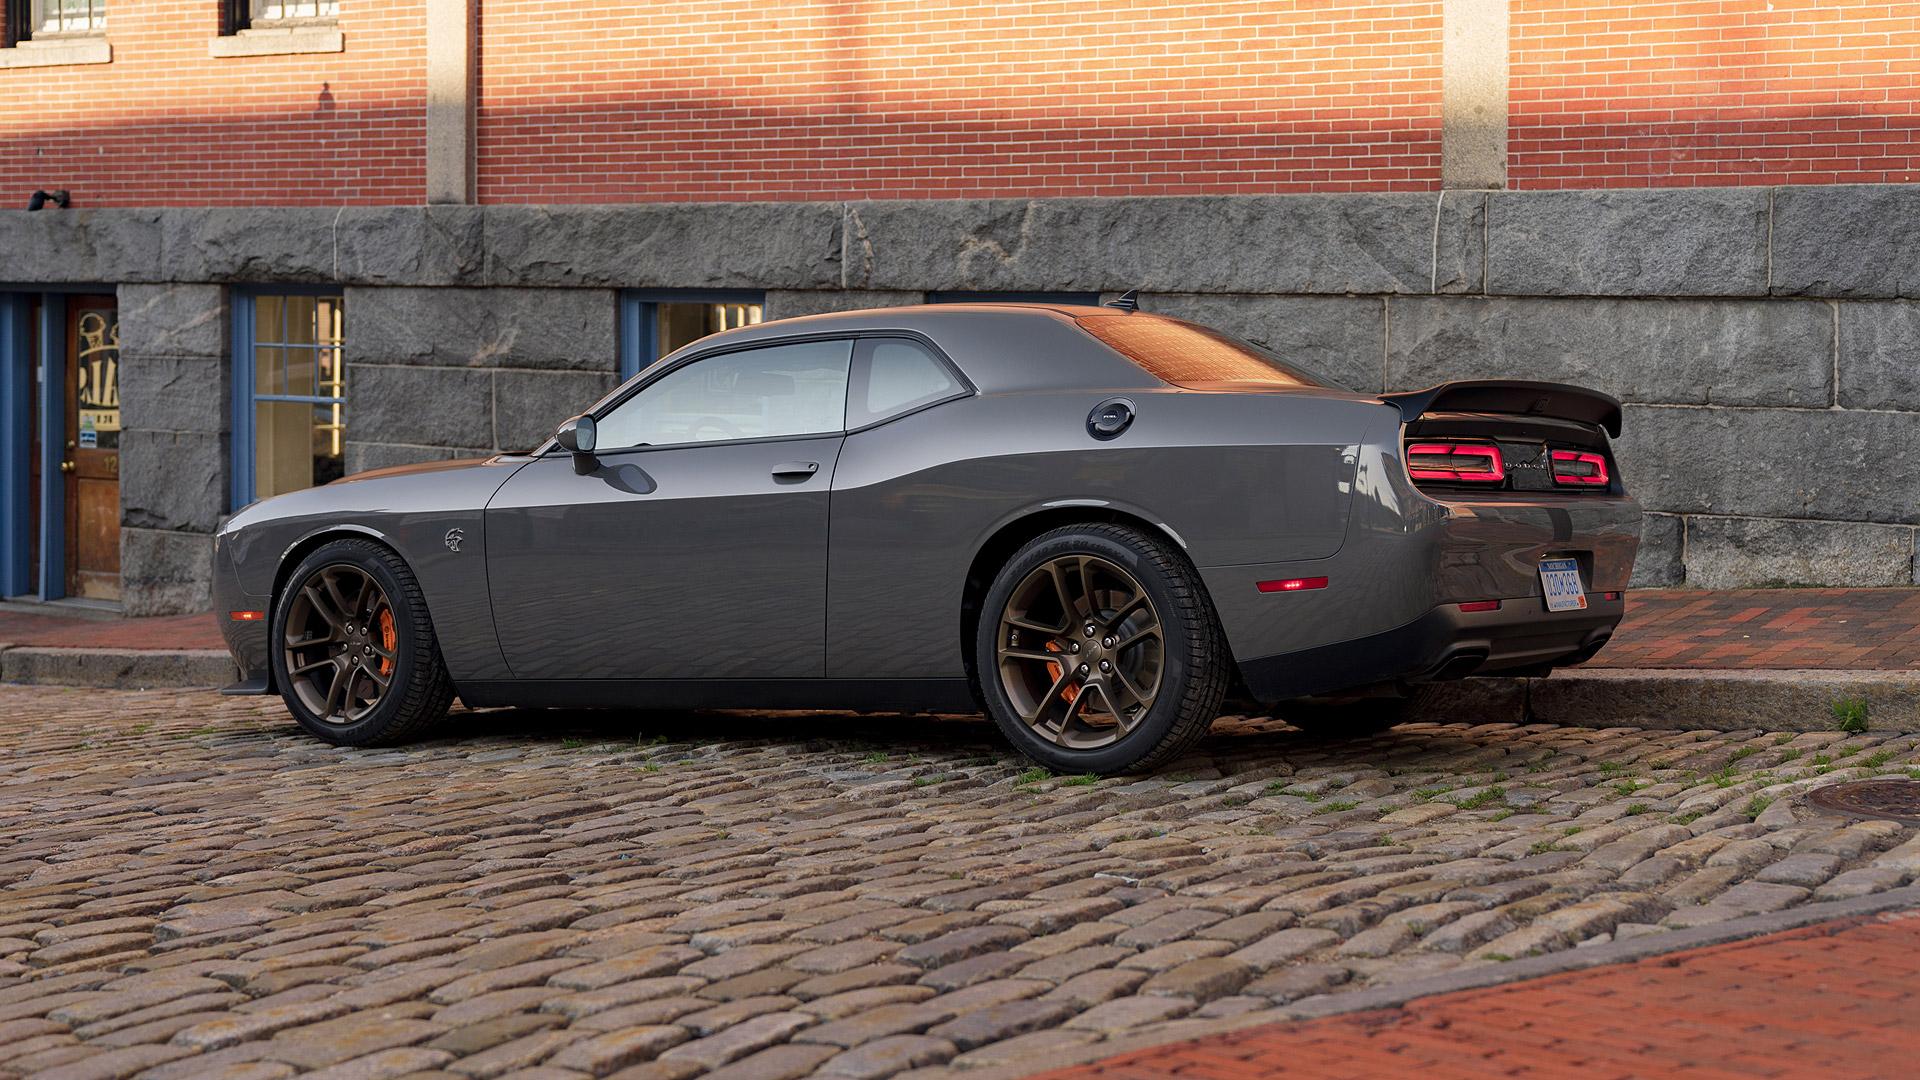 2019 Dodge Challenger SRT Hellcat Wallpapers HD Images